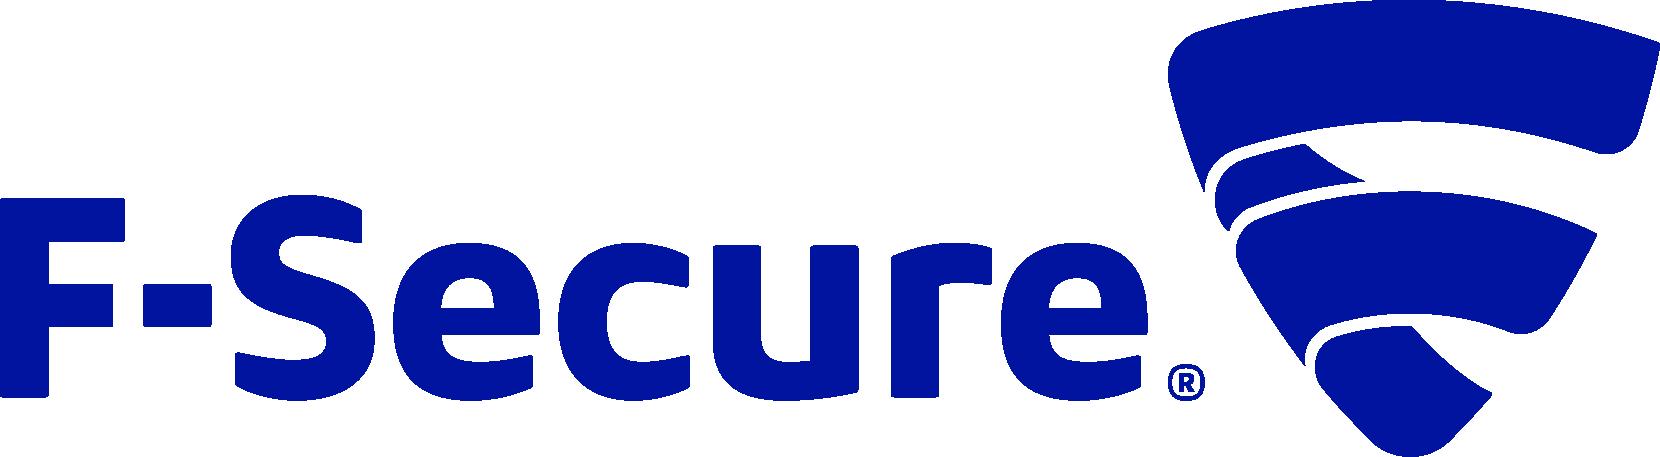 f-secure freedome logo